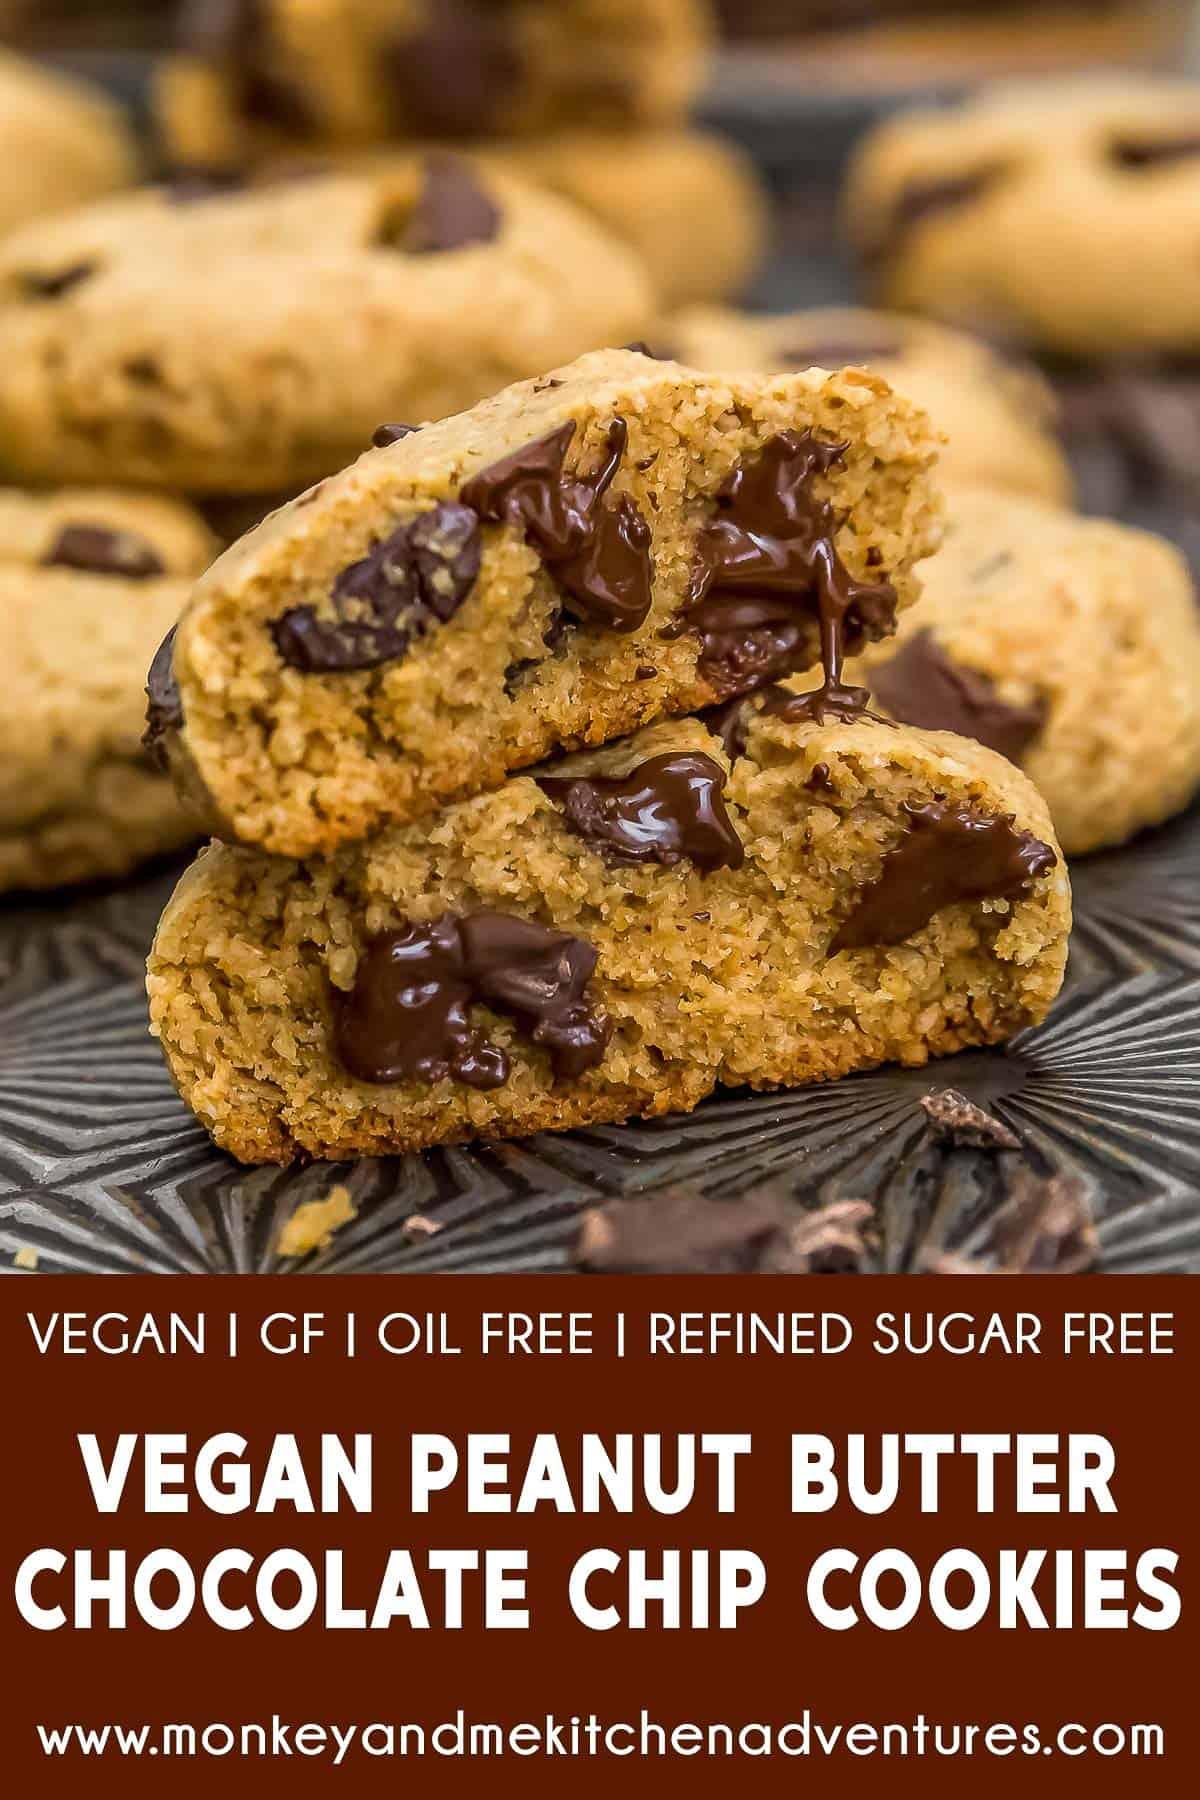 Vegan Peanut Butter Chocolate Chip Cookies with text description